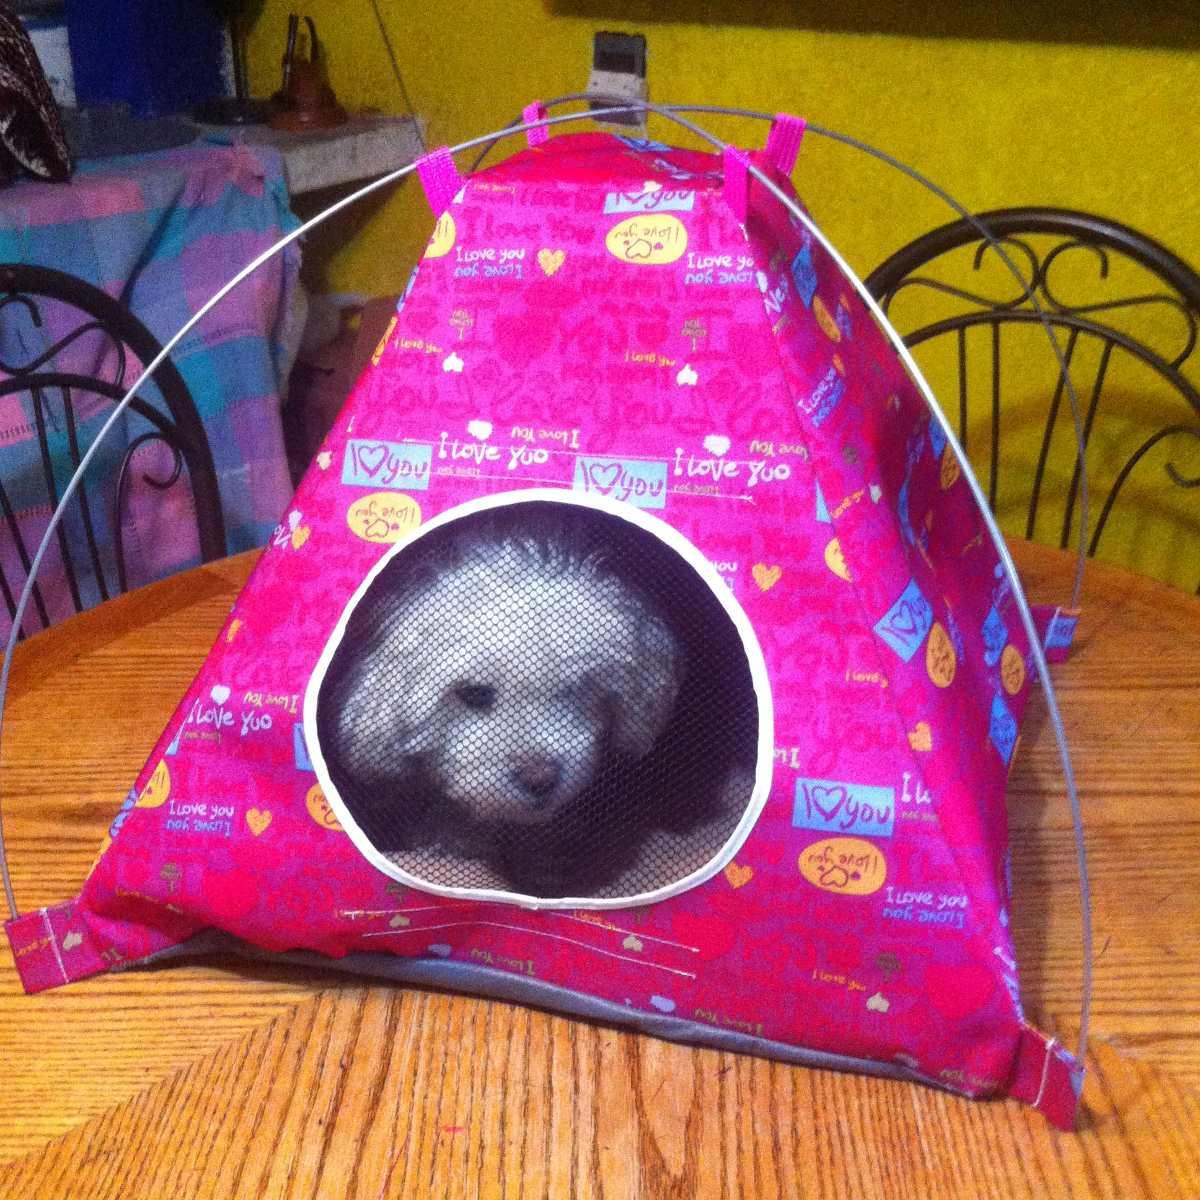 Accesorios para perros casas de campa a en - Accesorios para casa ...